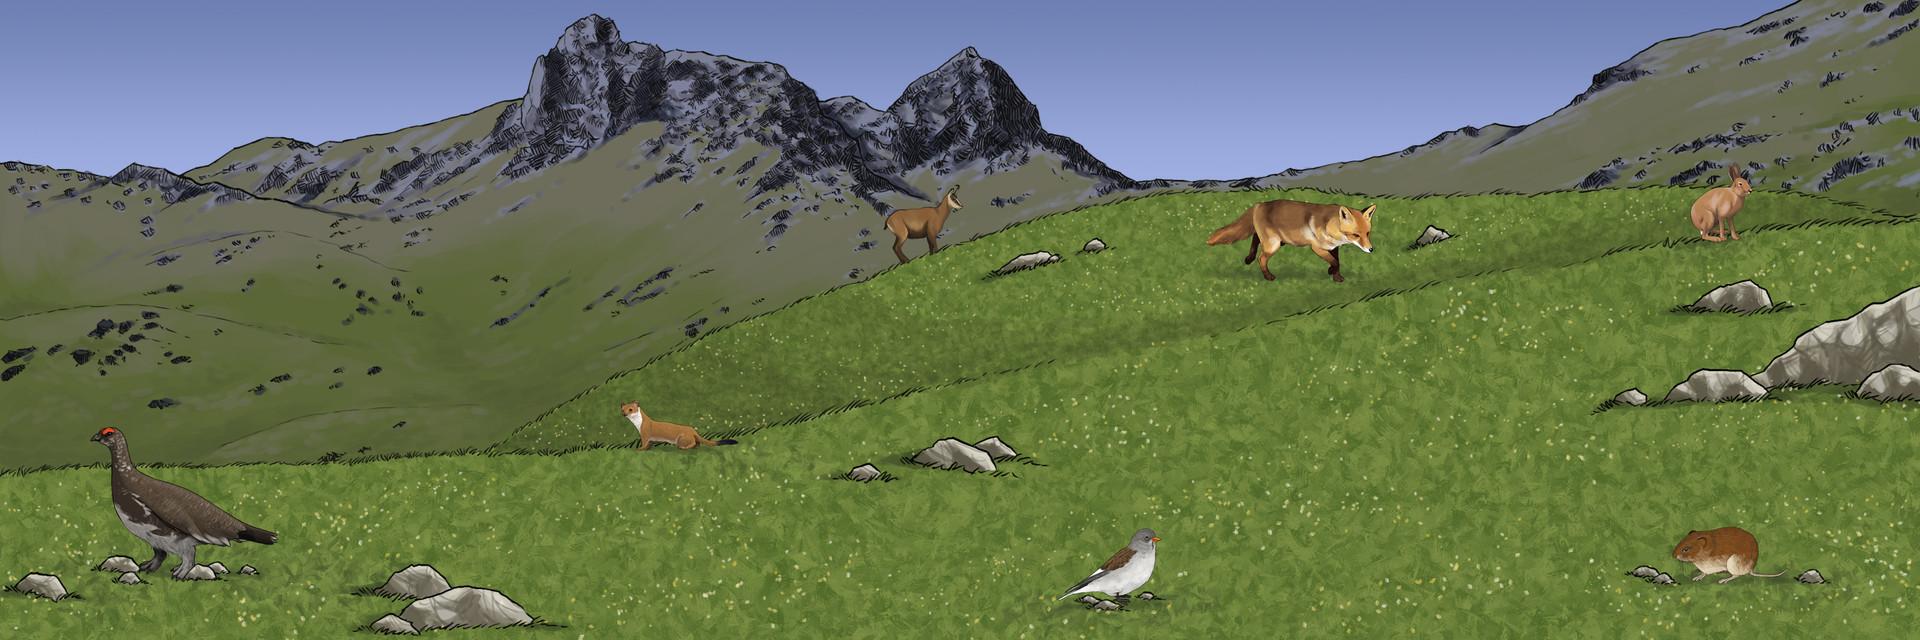 Paysage - Alpage Pri